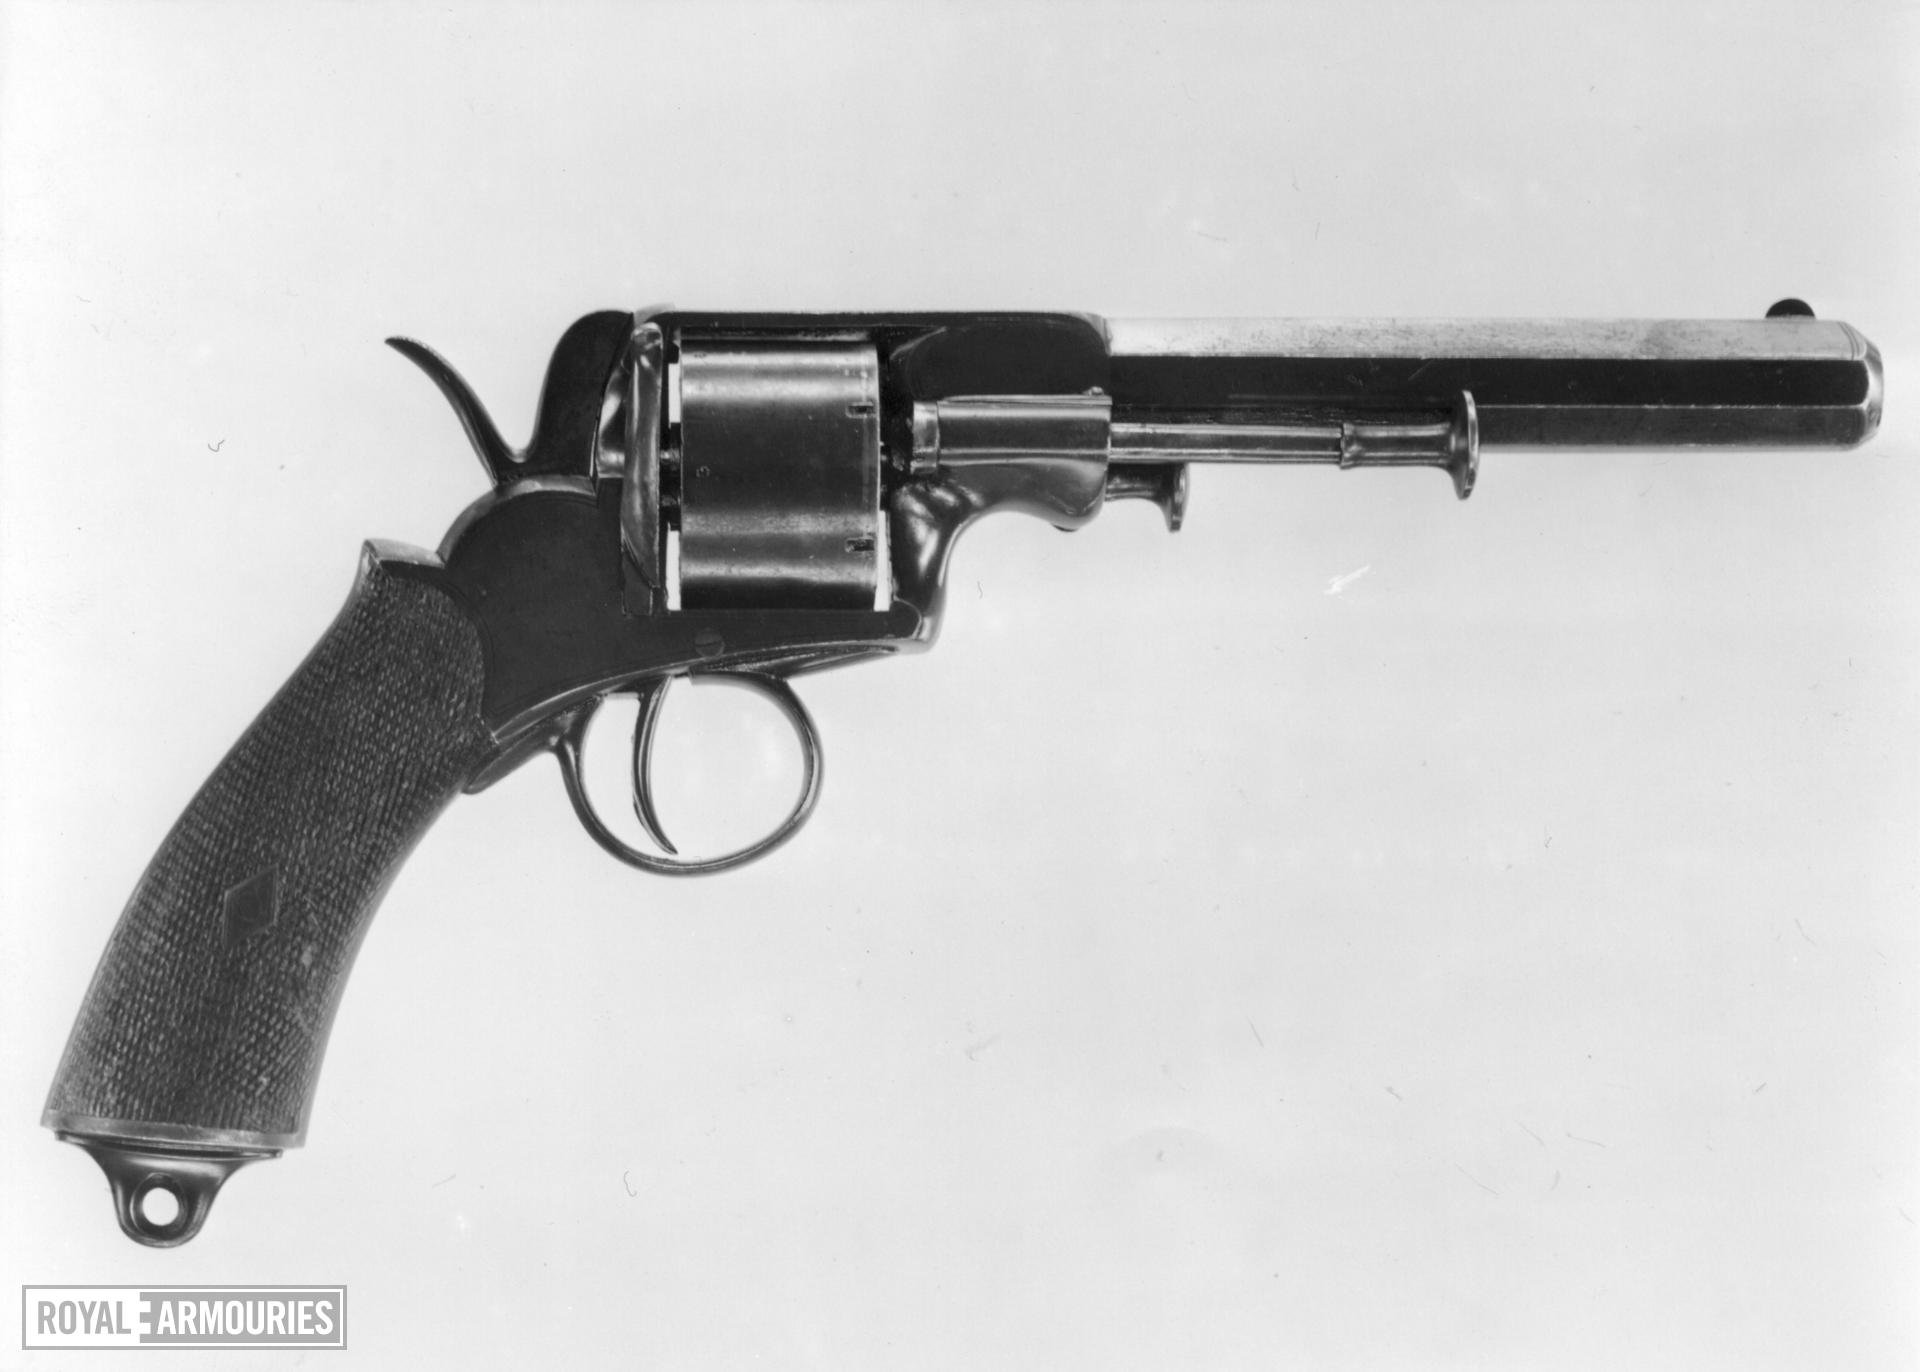 Rimfire six-shot revolver - Webley Solid Frame Model